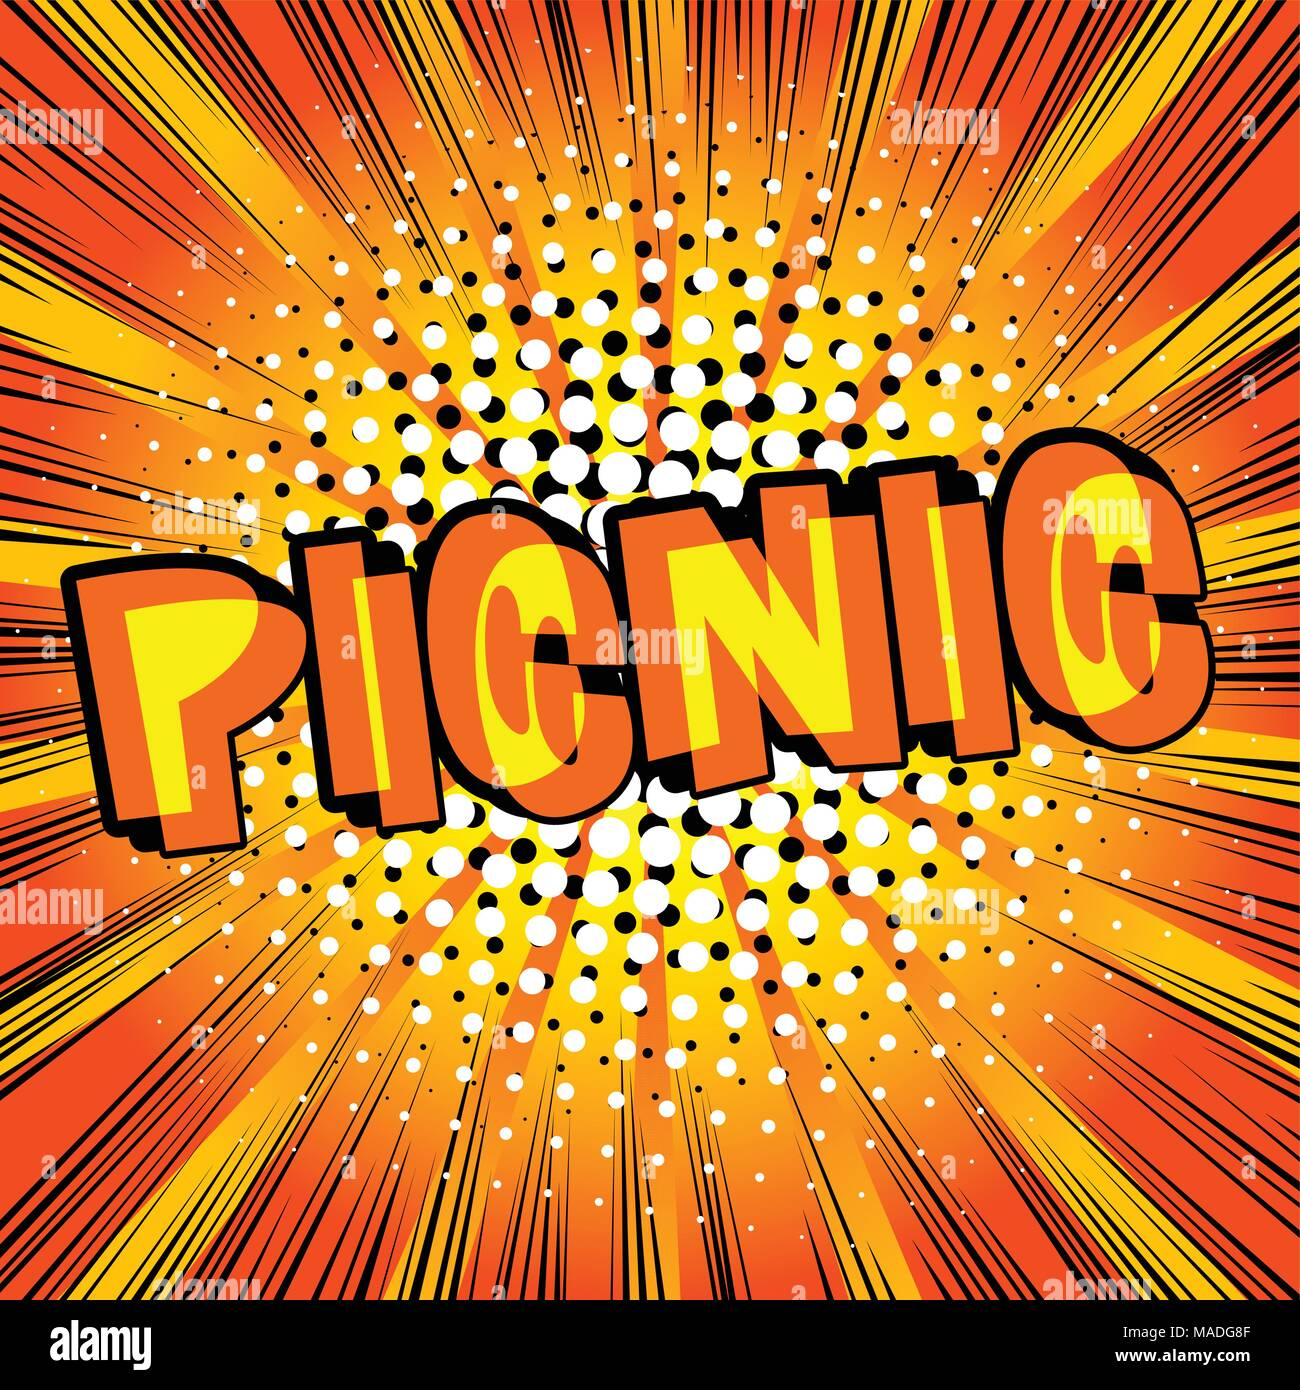 Picnic - estilo cómic palabra sobre fondo abstracto. Imagen De Stock